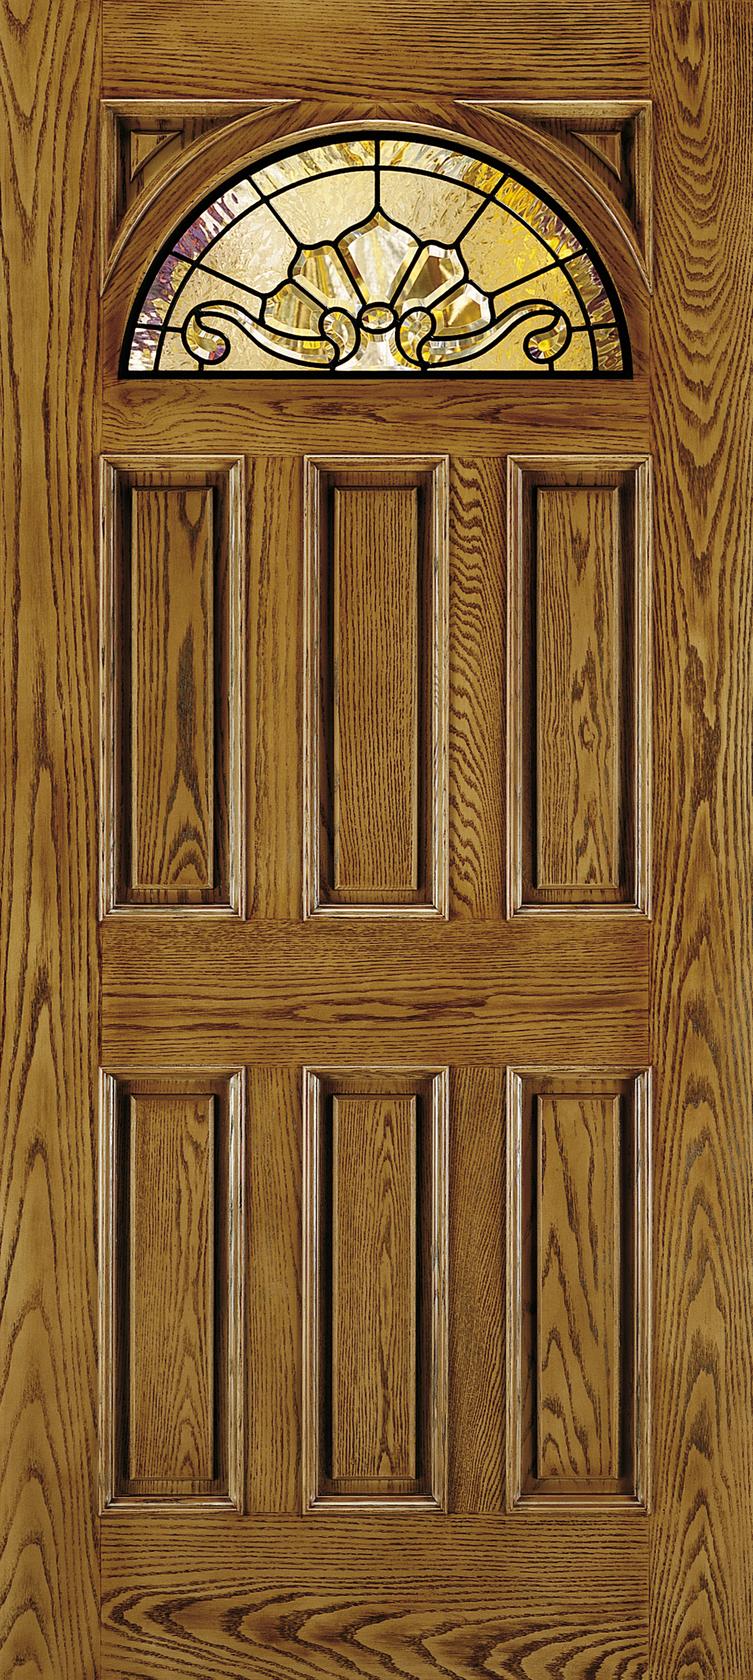 Aurora Custom Fiberglass Glass Panel Exterior Door Jeld Wen Windows Doors Exterior Doors Doors Glass Panels